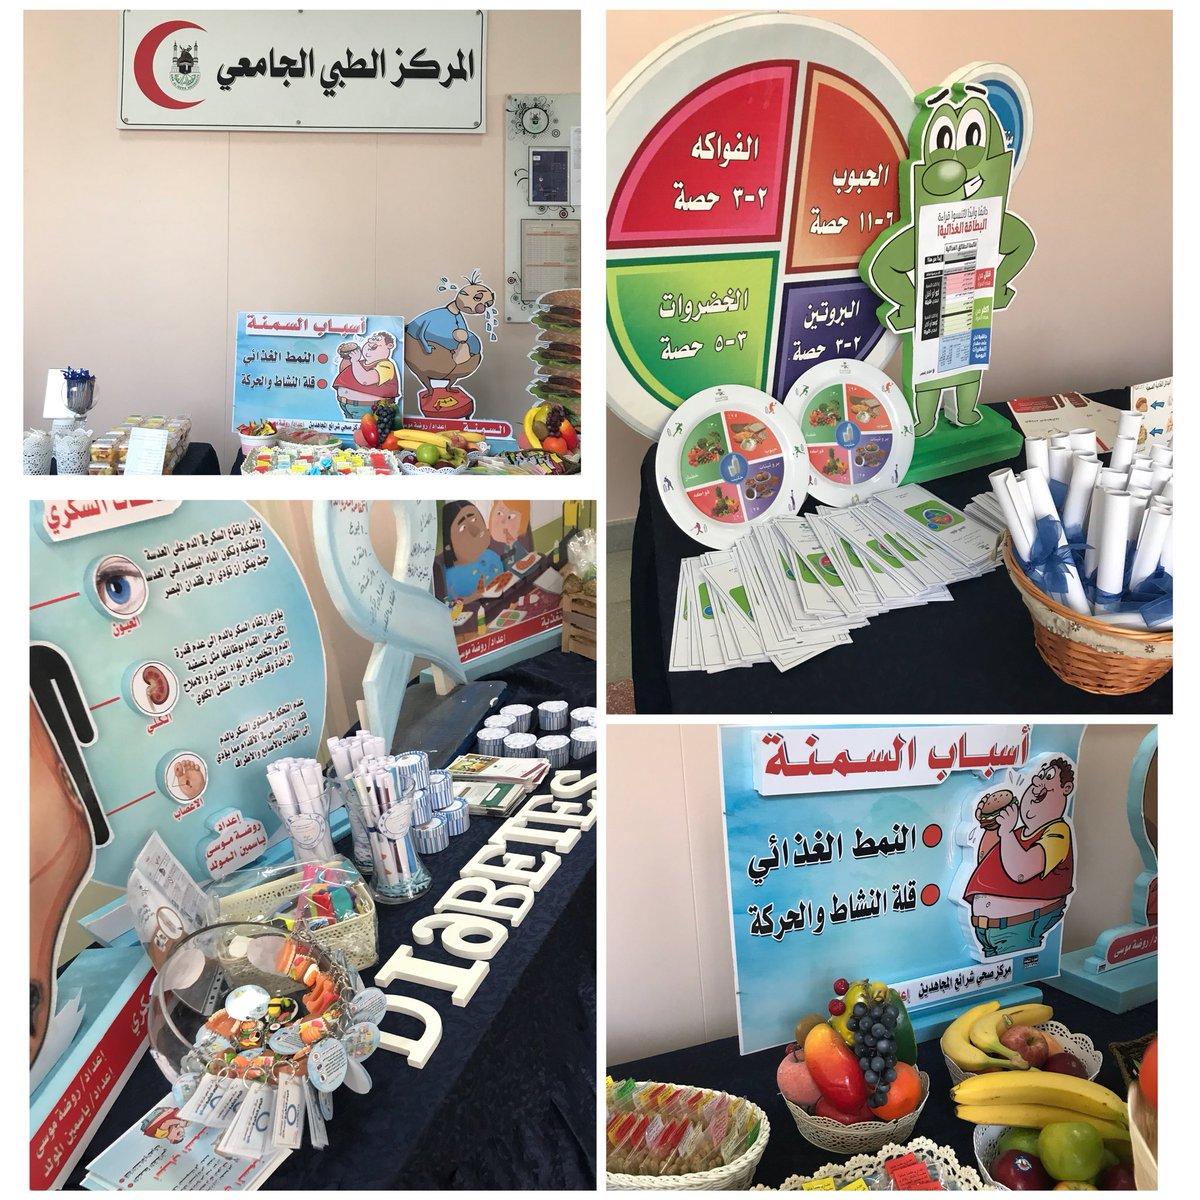 RT @Asel111Yaho: #diabetesday حملة اهتمامي أساس صحتي وجمالي https://t.co/jFxMUedQLg